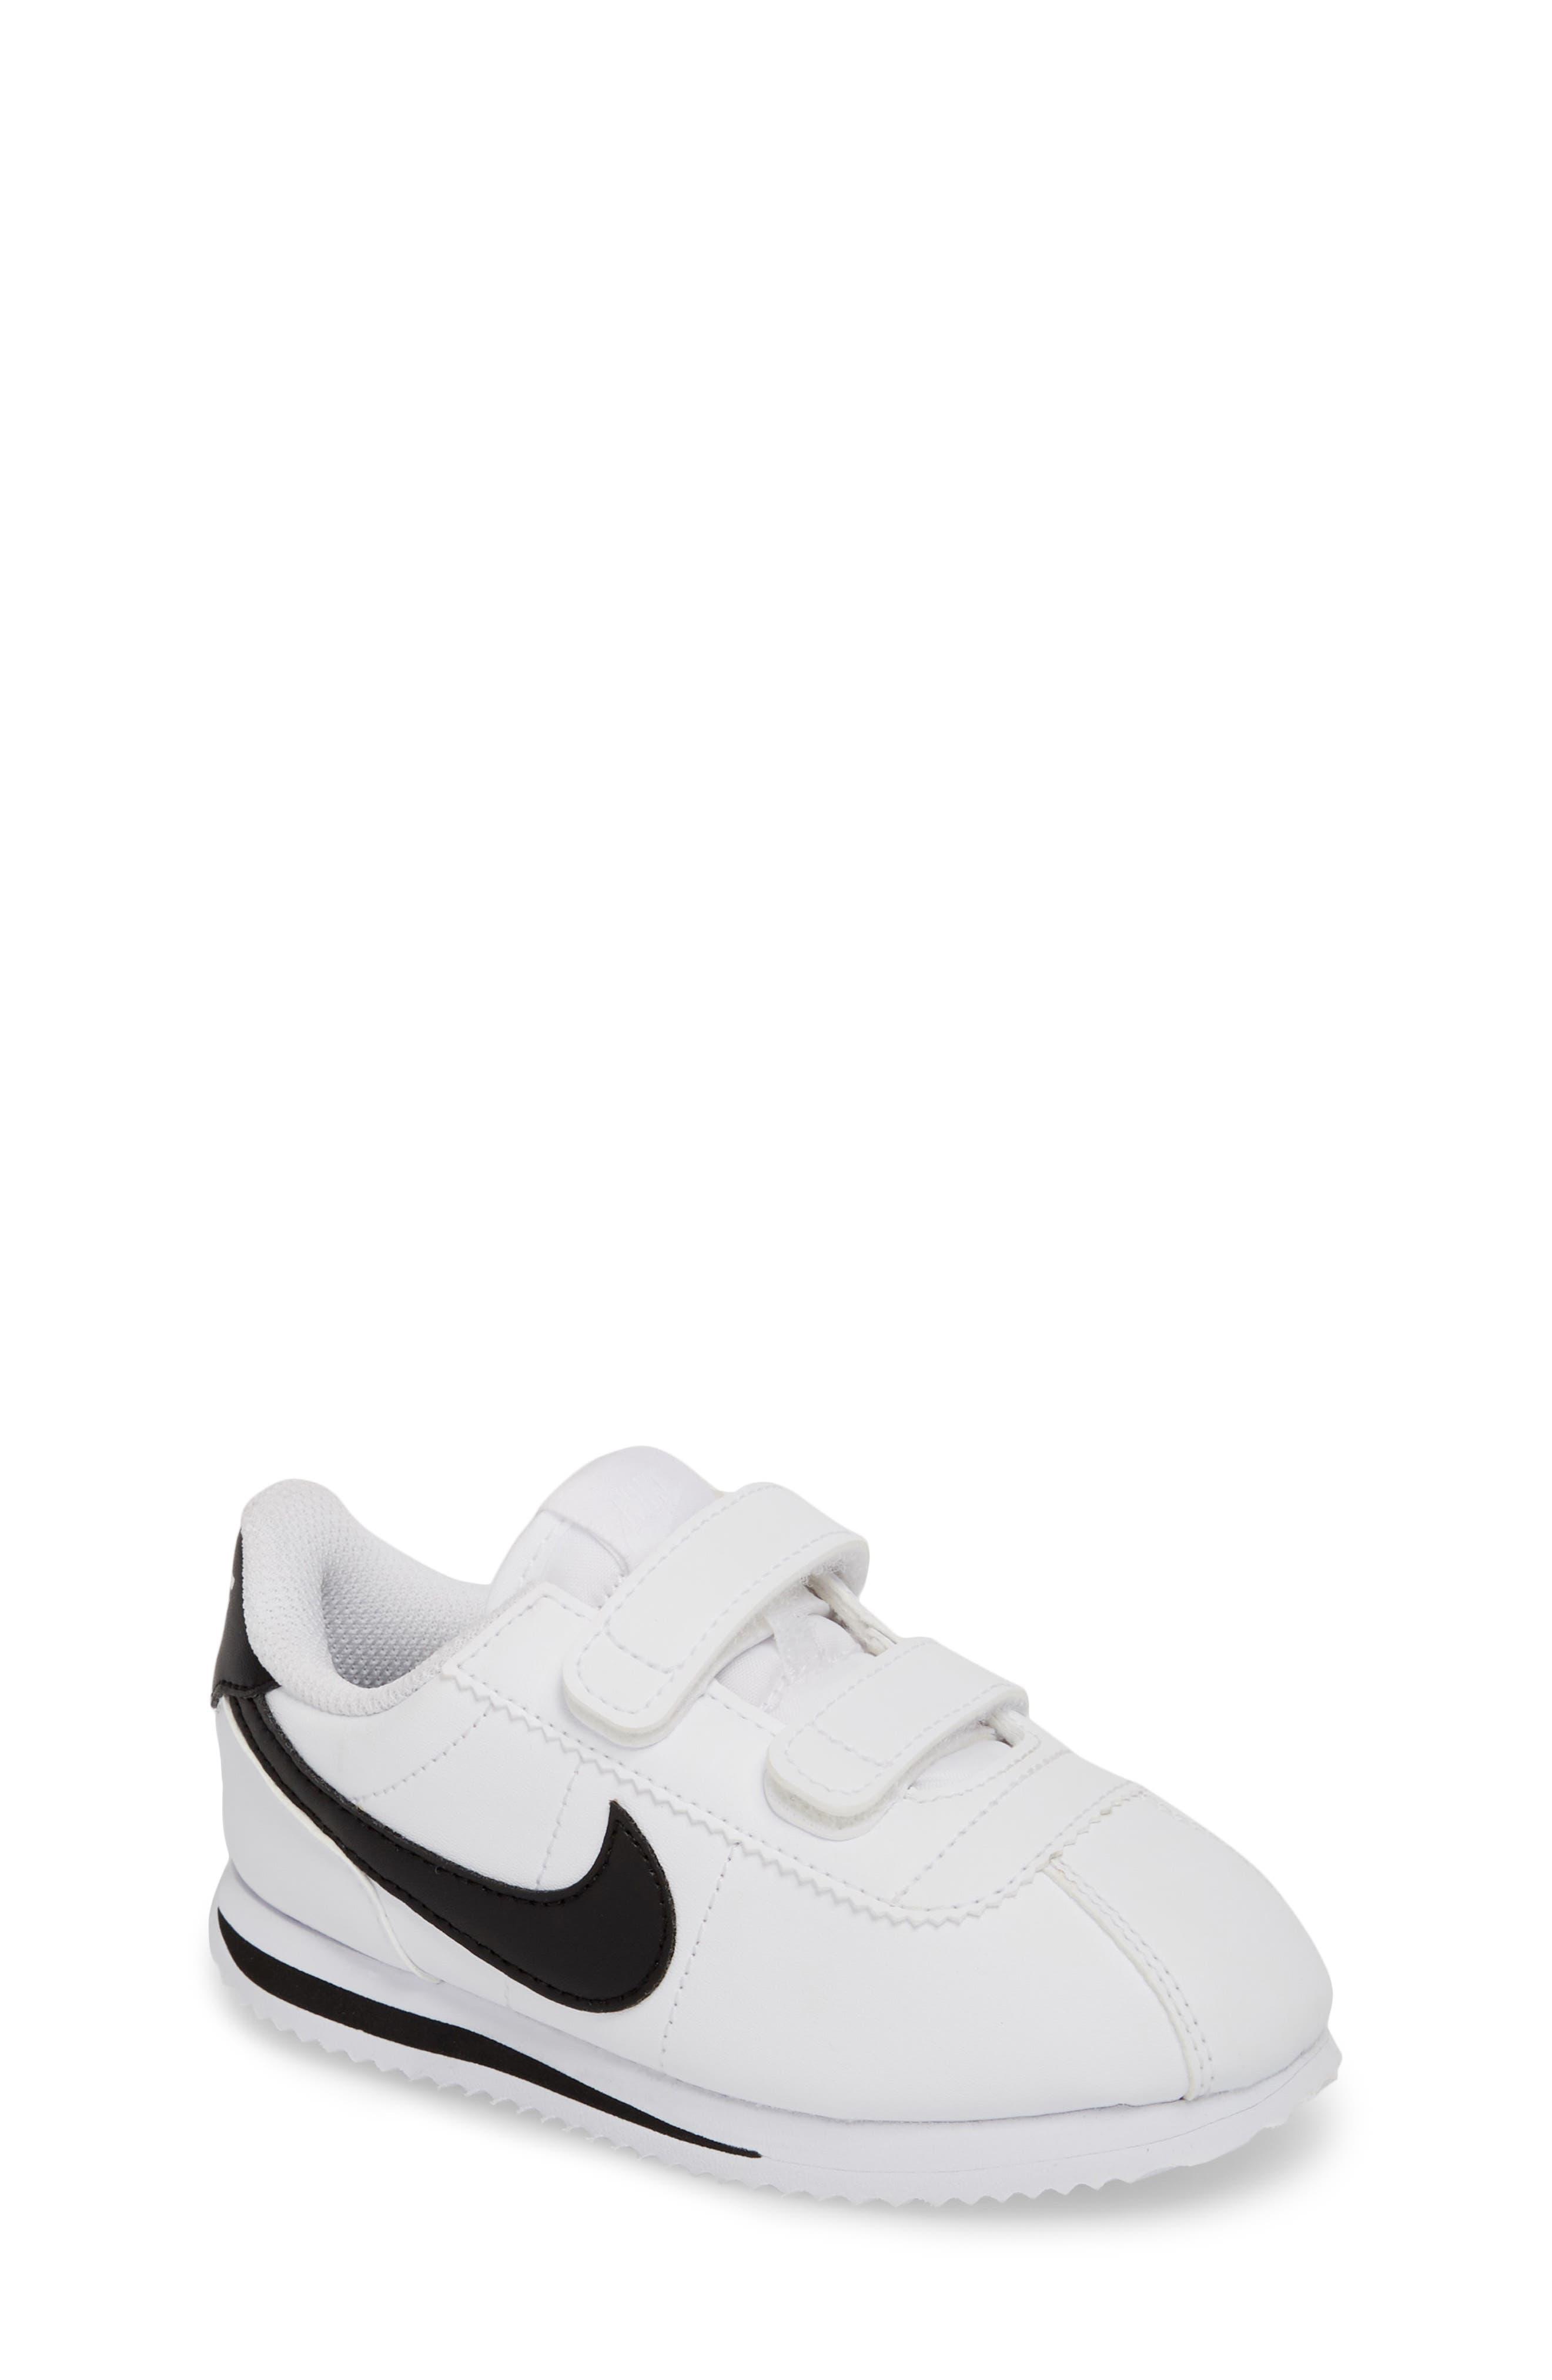 Cortez Basic SL Sneaker,                             Main thumbnail 1, color,                             White/ Black